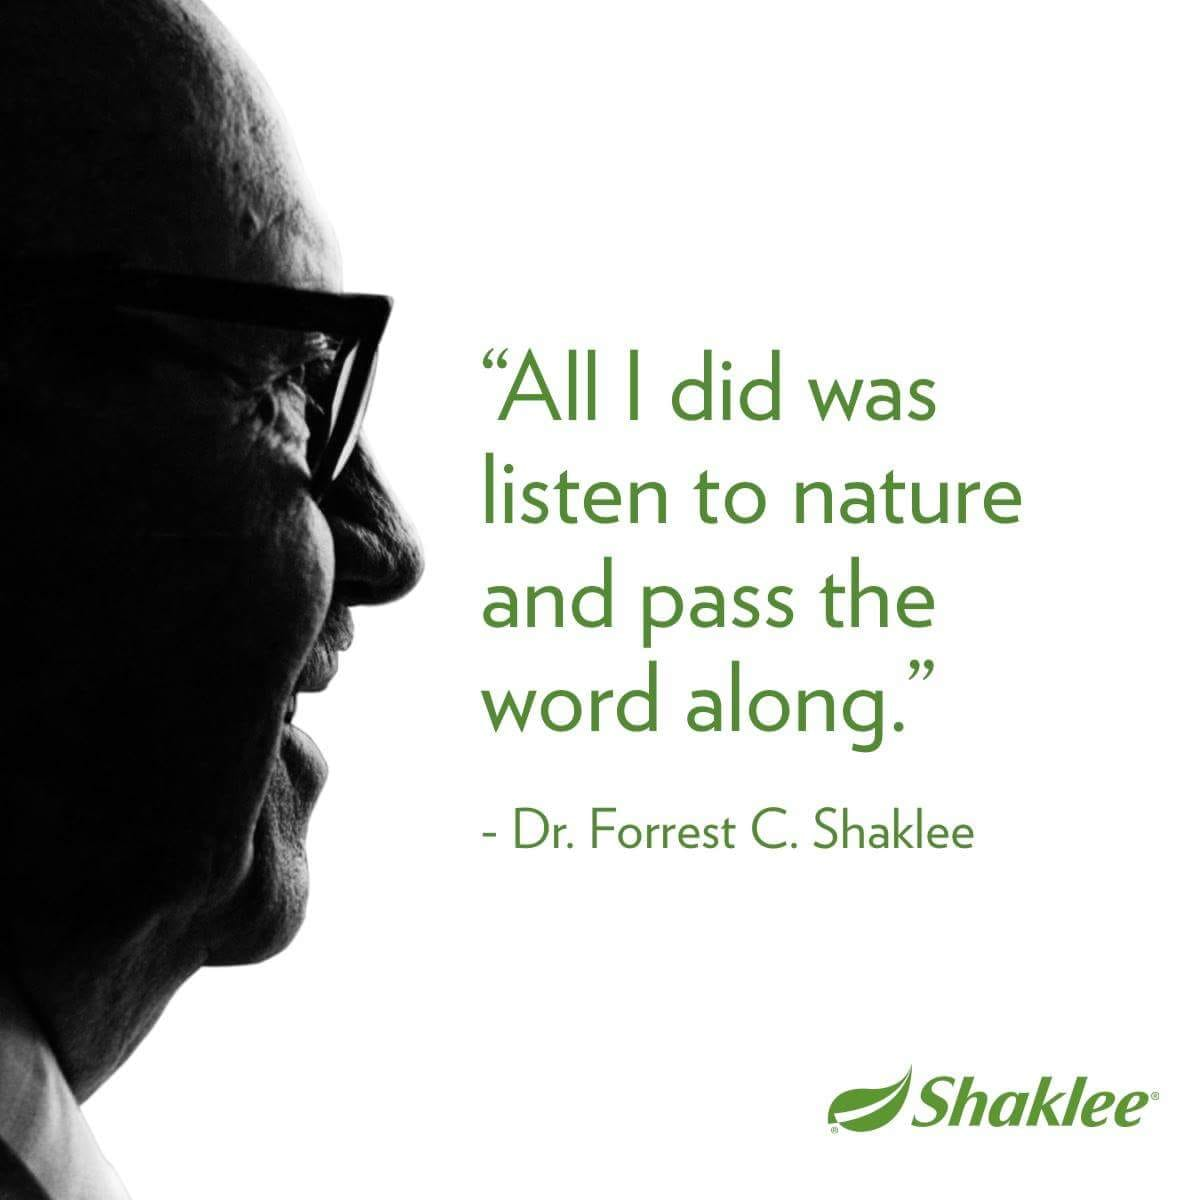 Sejarah Shaklee